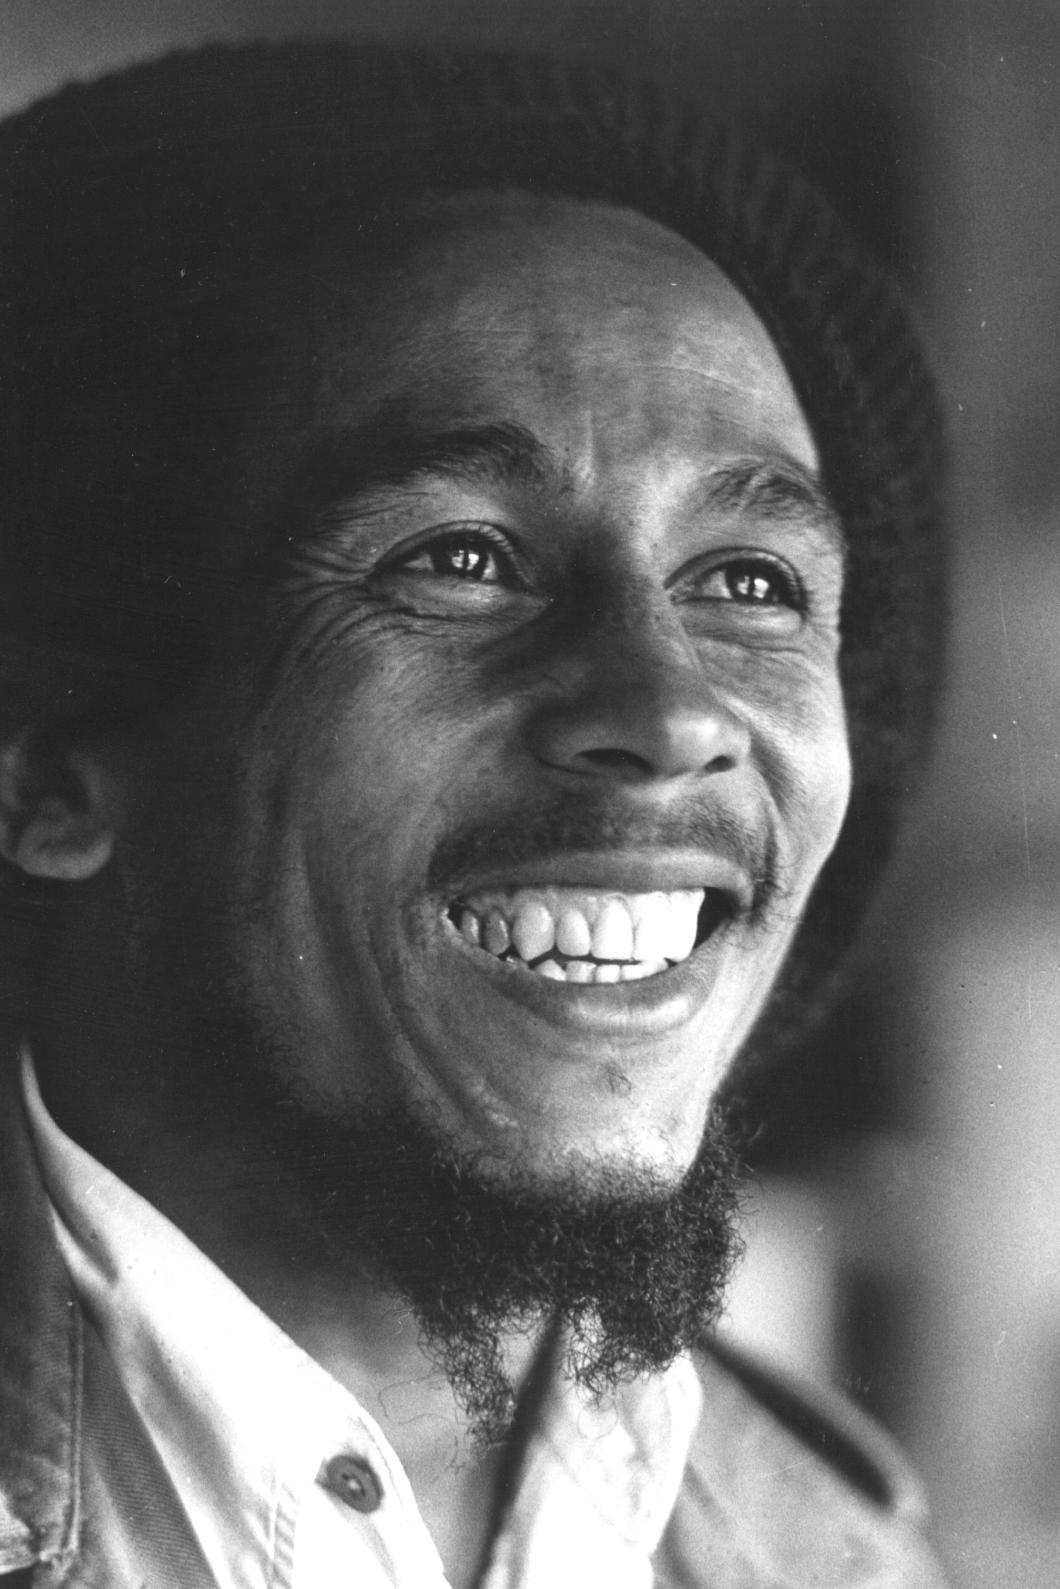 Marley Smiling